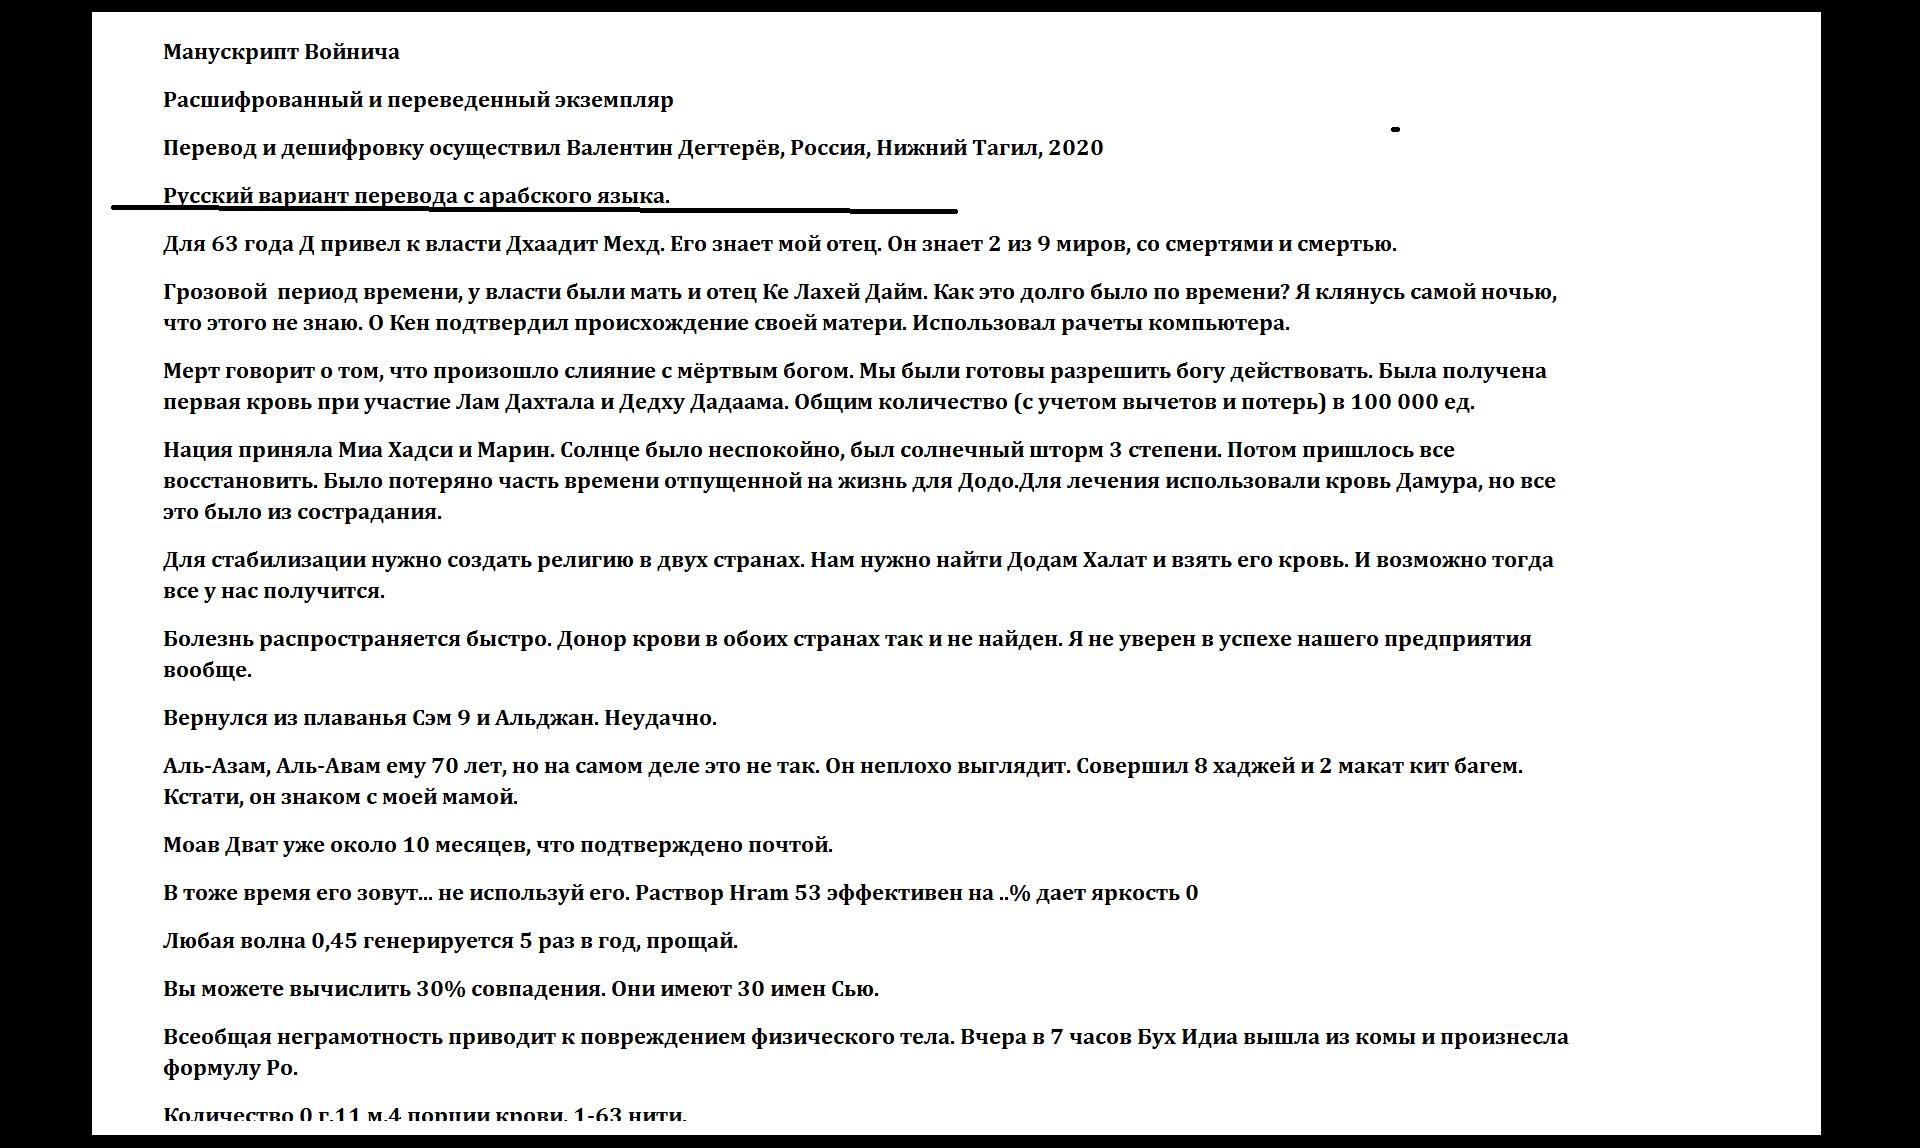 Манускрипт Войнича расшифрован и переведен.